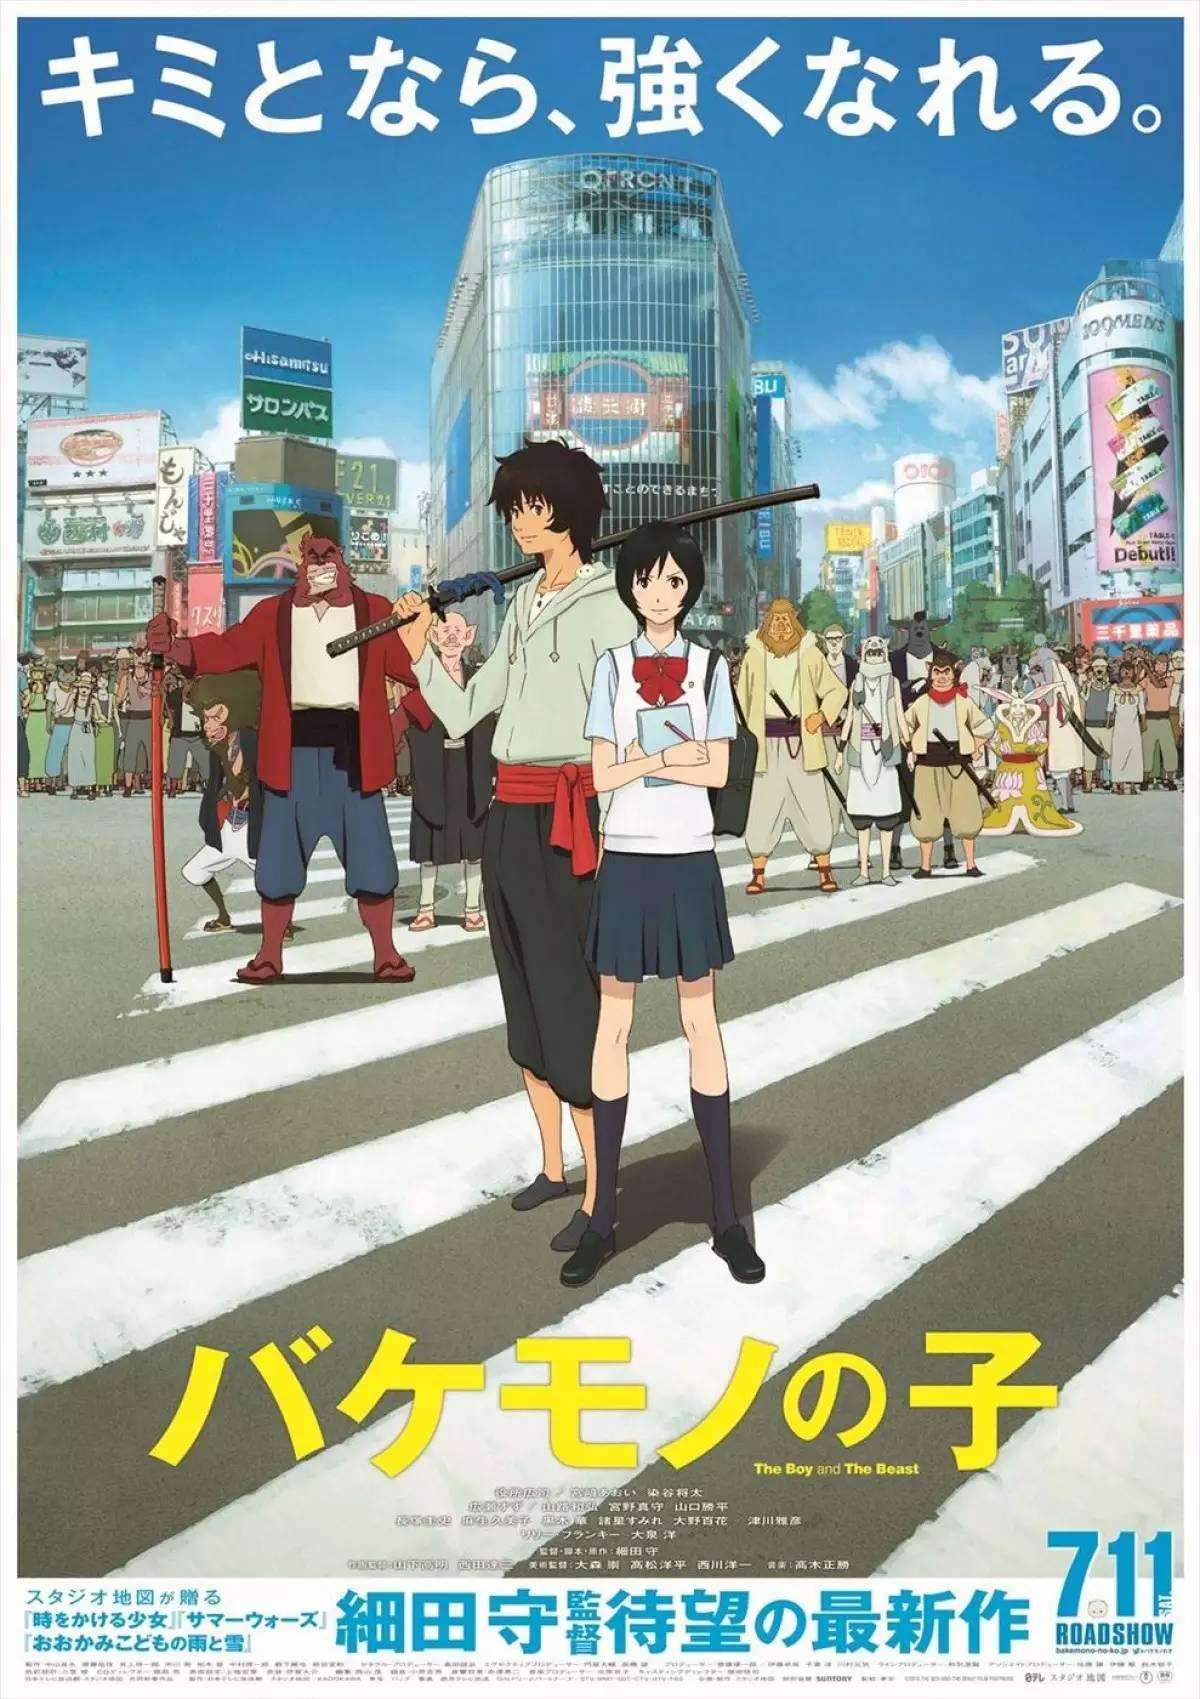 dkRanew2NMd2A - [Aporte] Bakemono no Ko [Pelicula][BD][720p][10Bits][440Mb][MEGA] - Anime Ligero [Descargas]